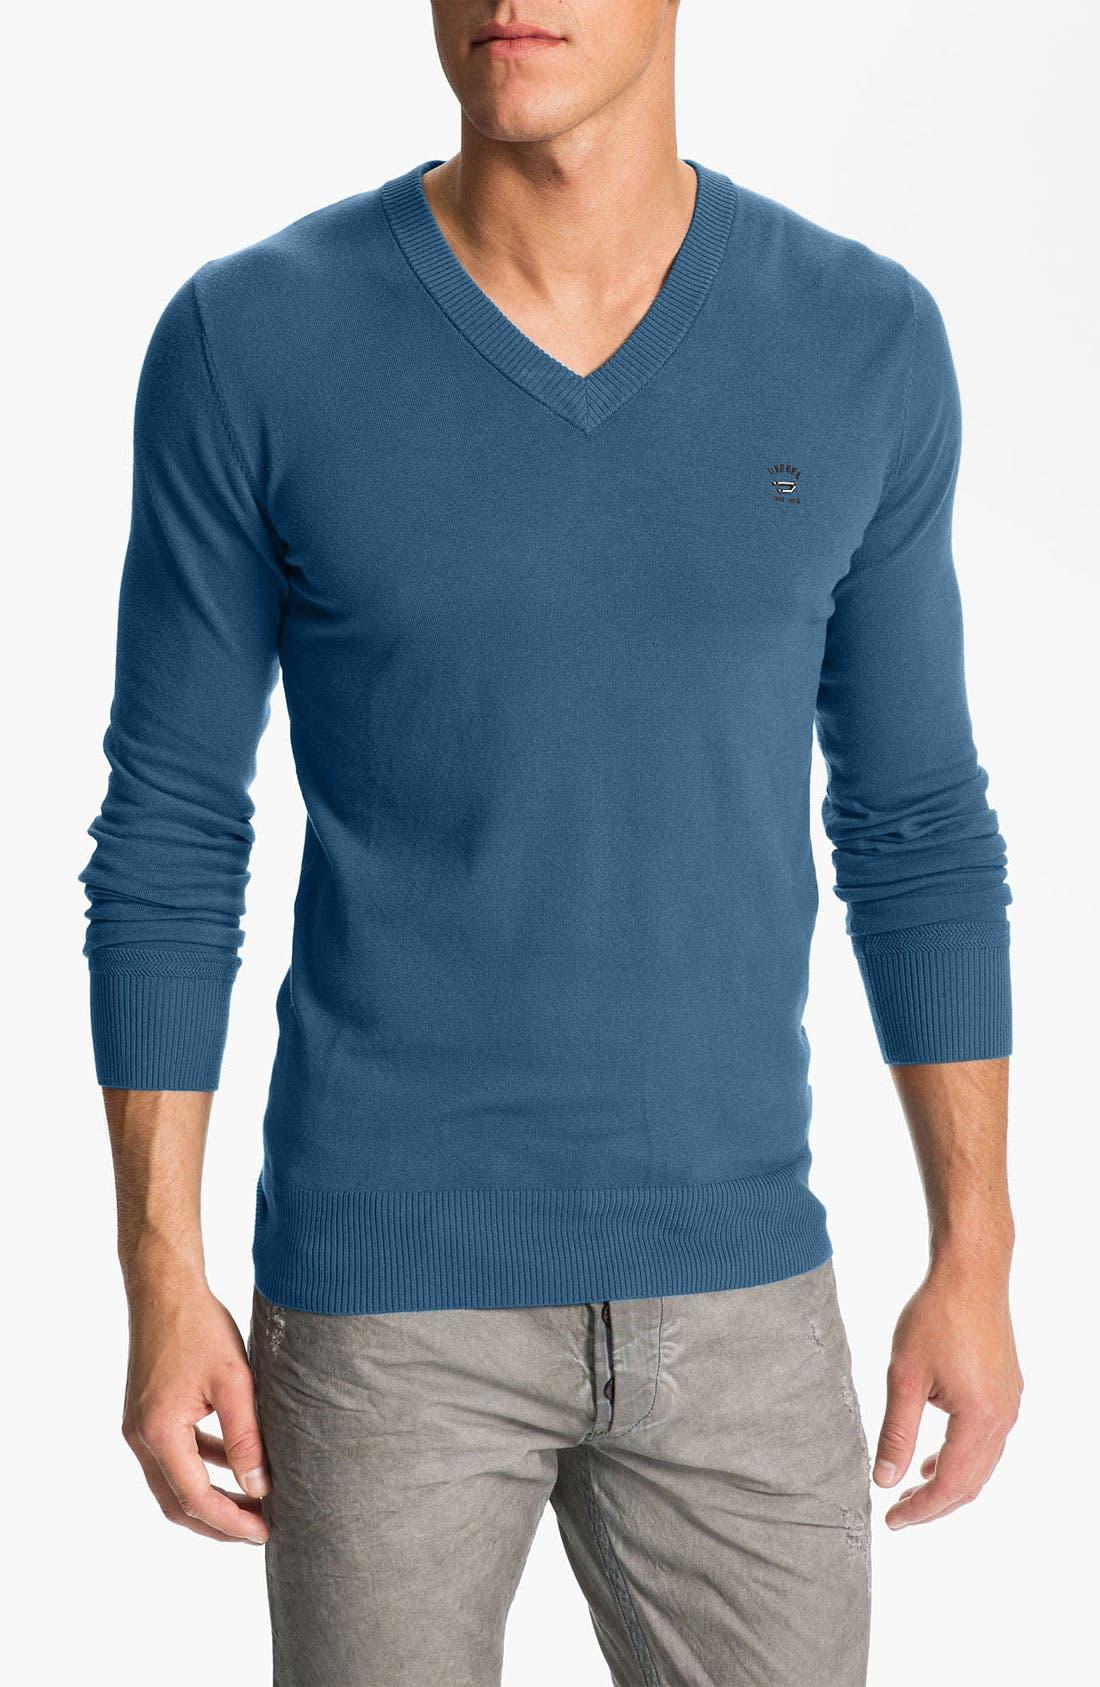 Alternate Image 1 Selected - DIESEL® 'K-Meceneo' V-Neck Sweater